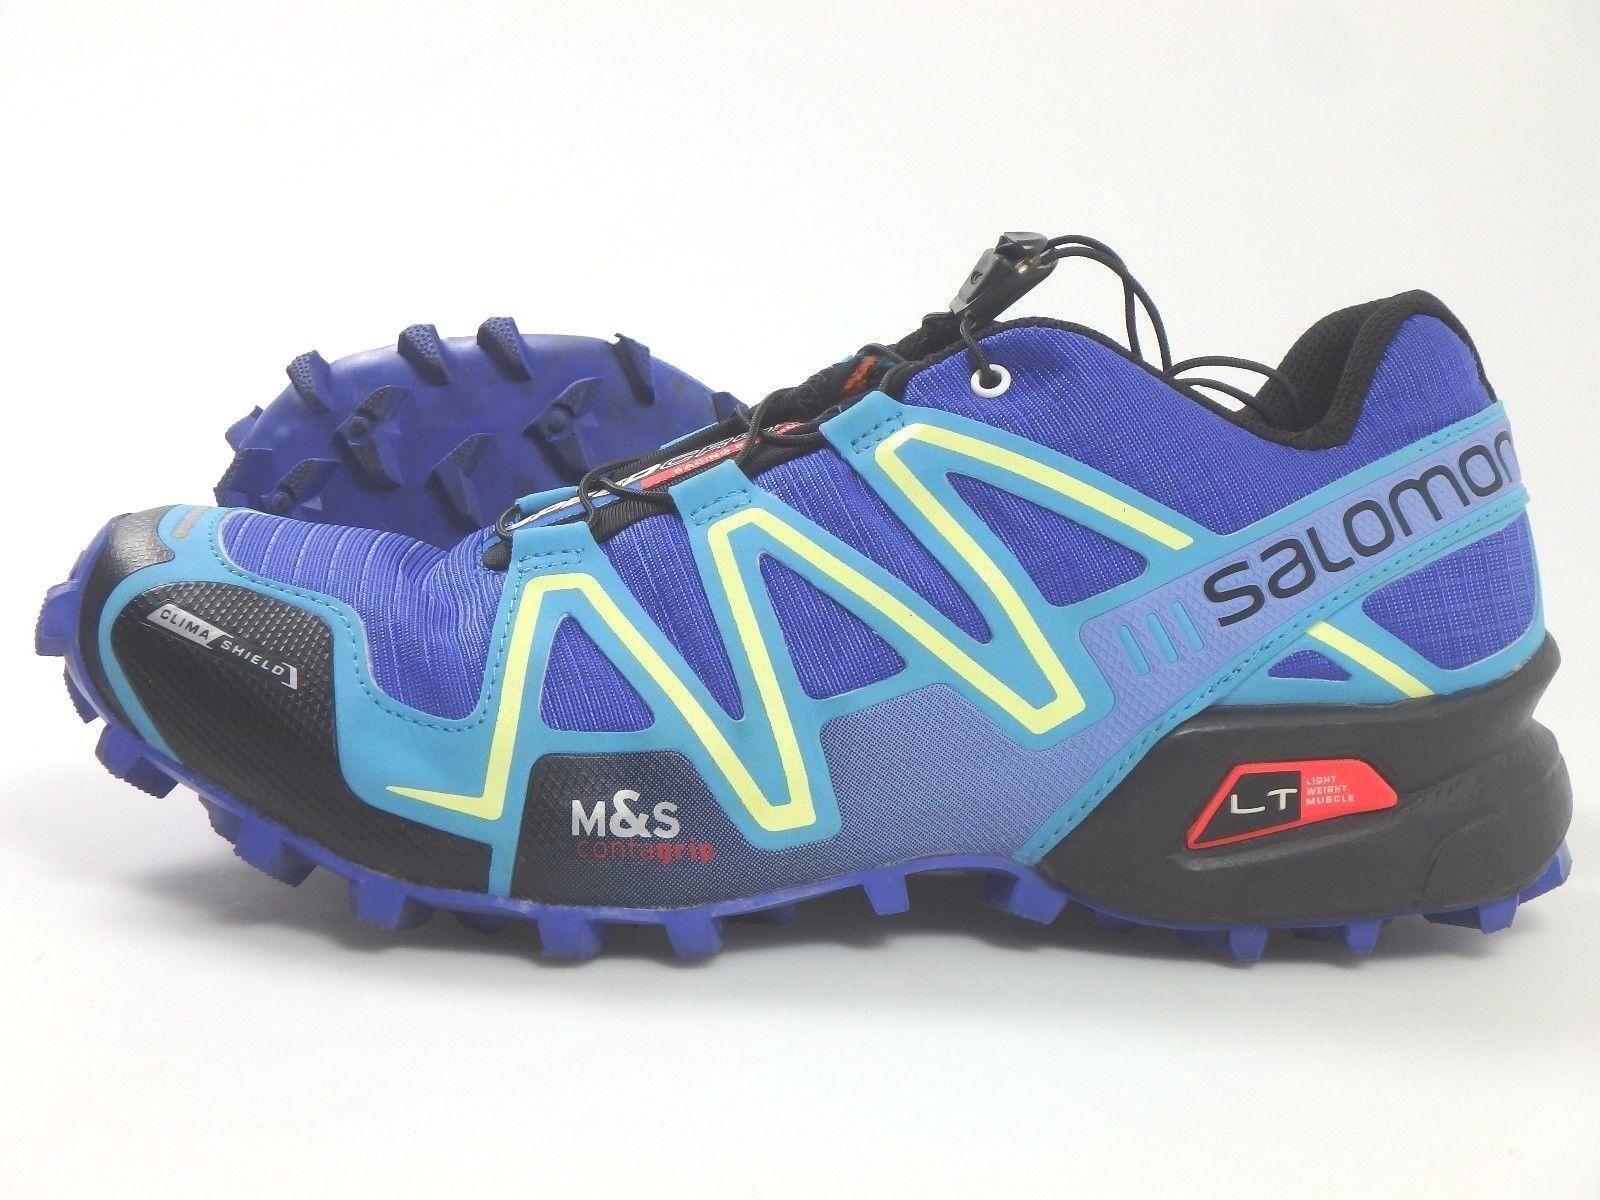 27235 Salomon Speedcross 3 Scarpe Da Corsa Correre Scarpe Jogging Uomo 41 1/3 BLU